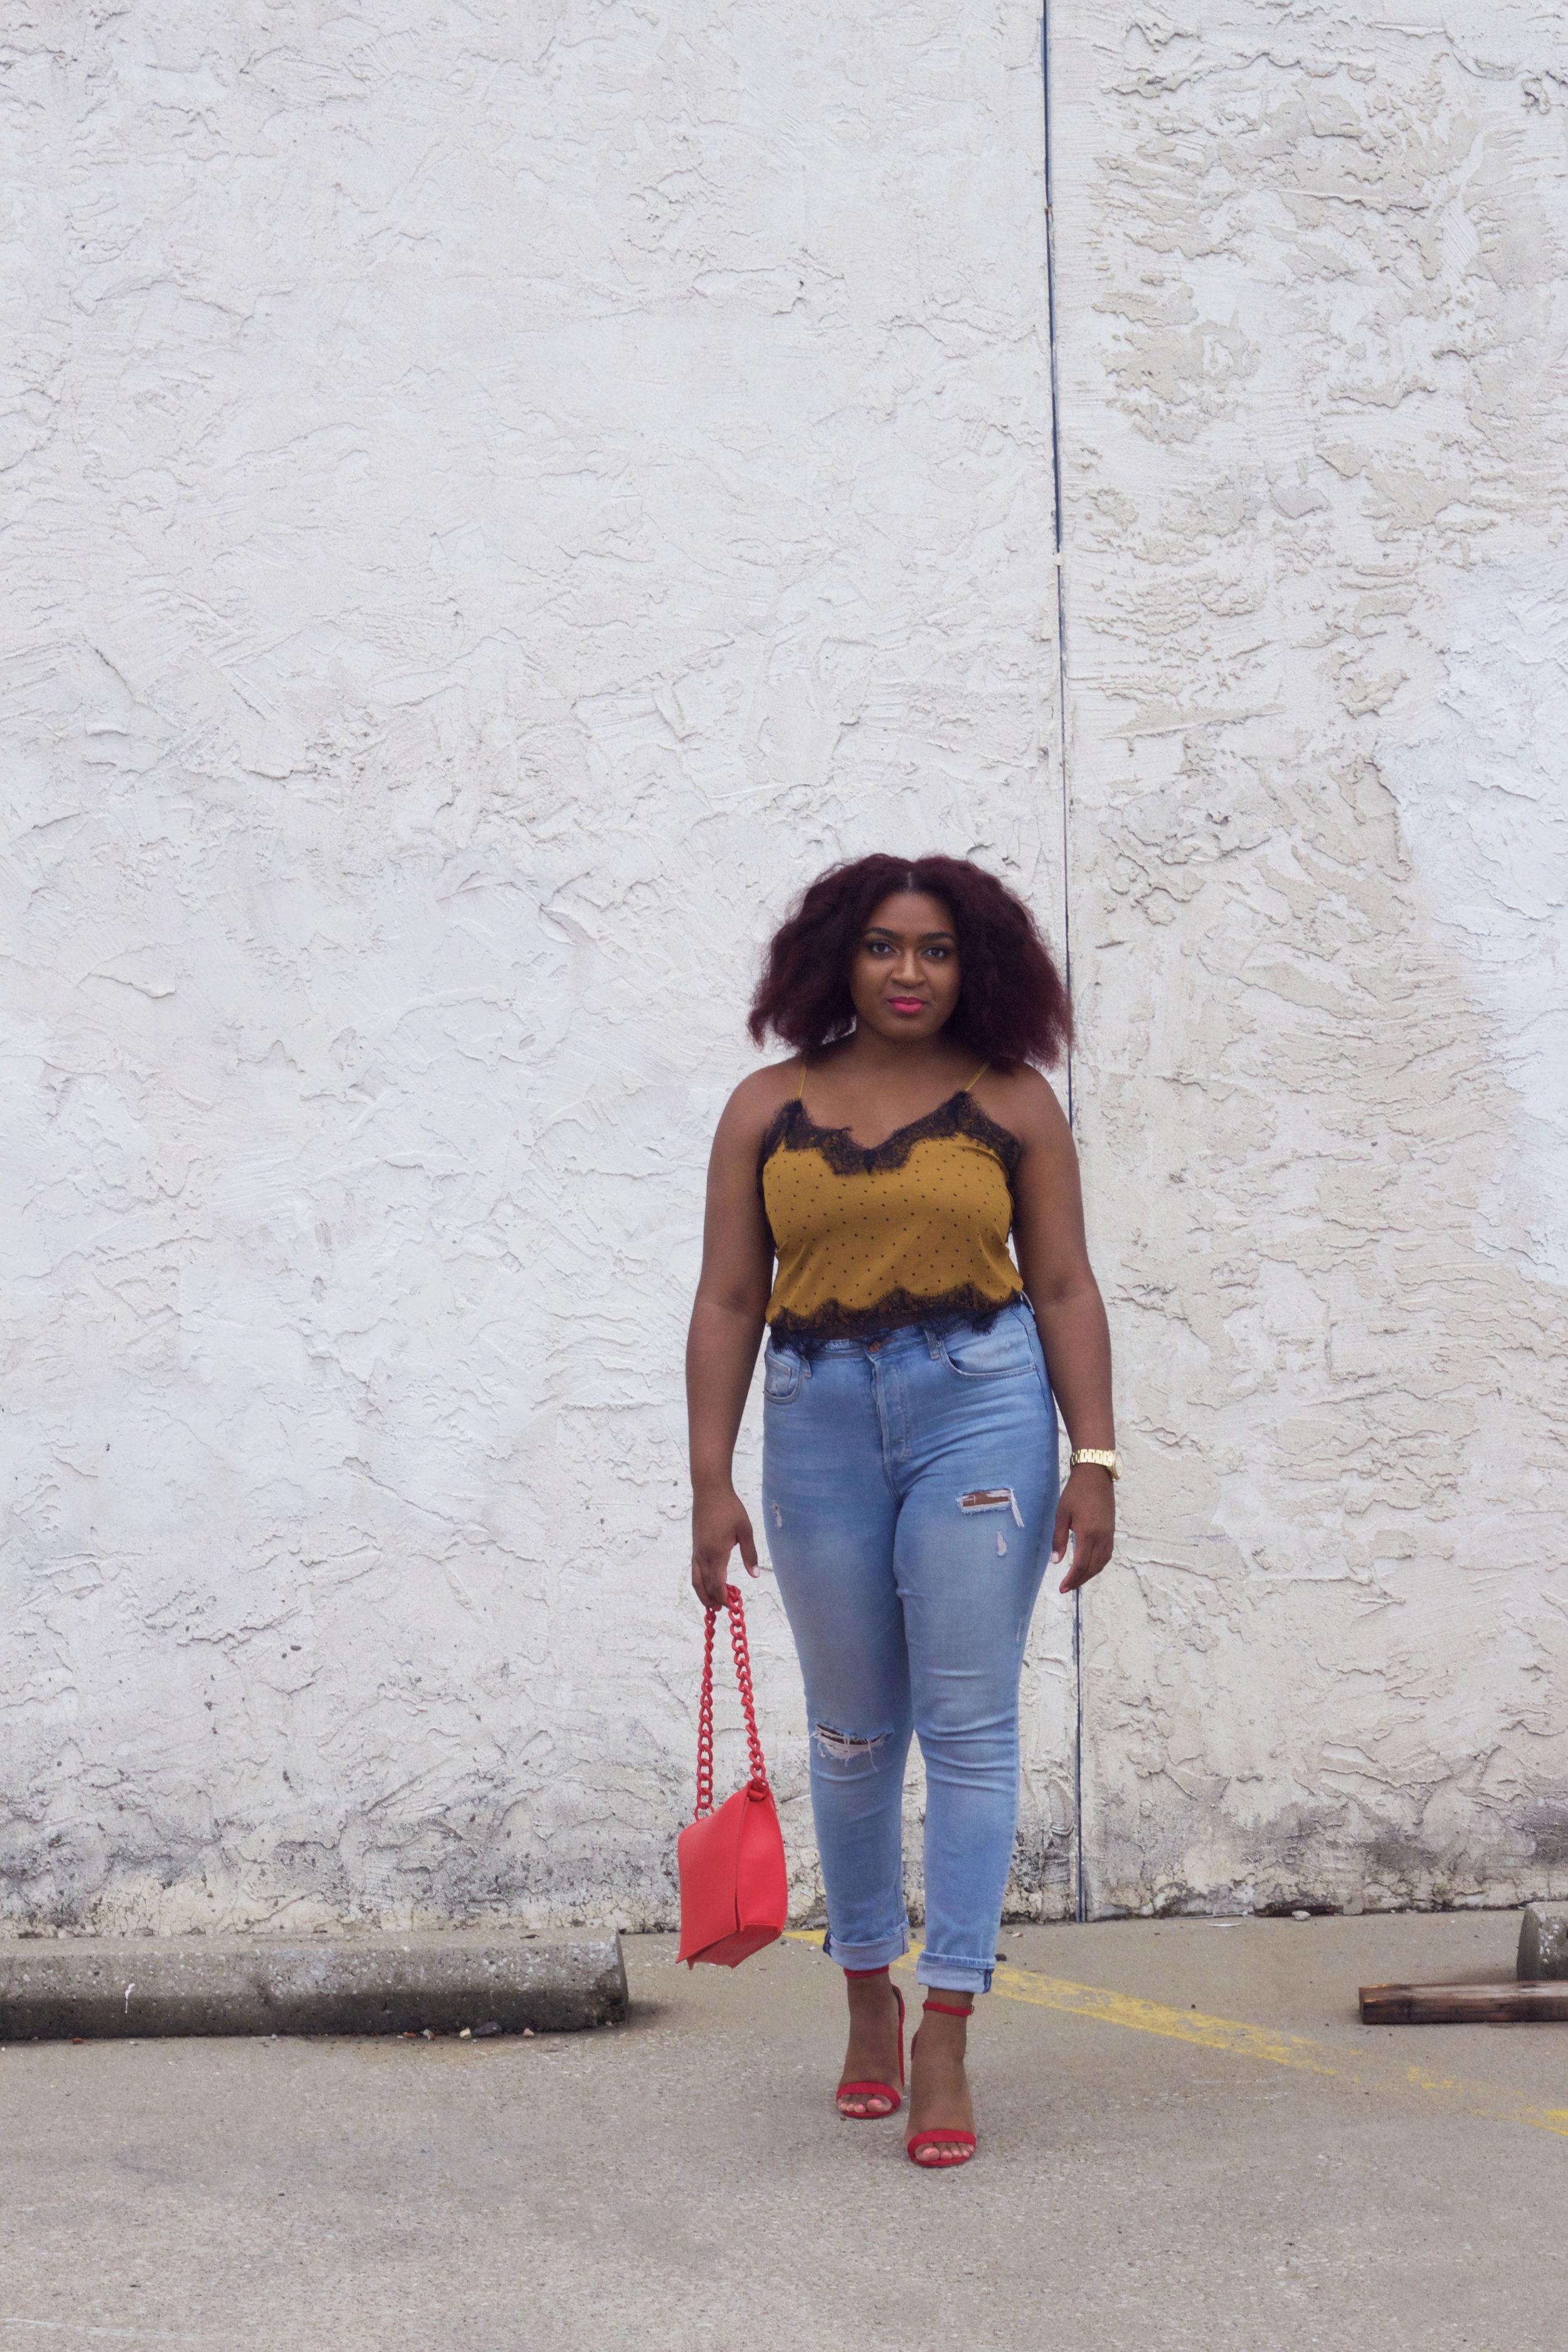 jasmine diane with big natural hair in kansas city